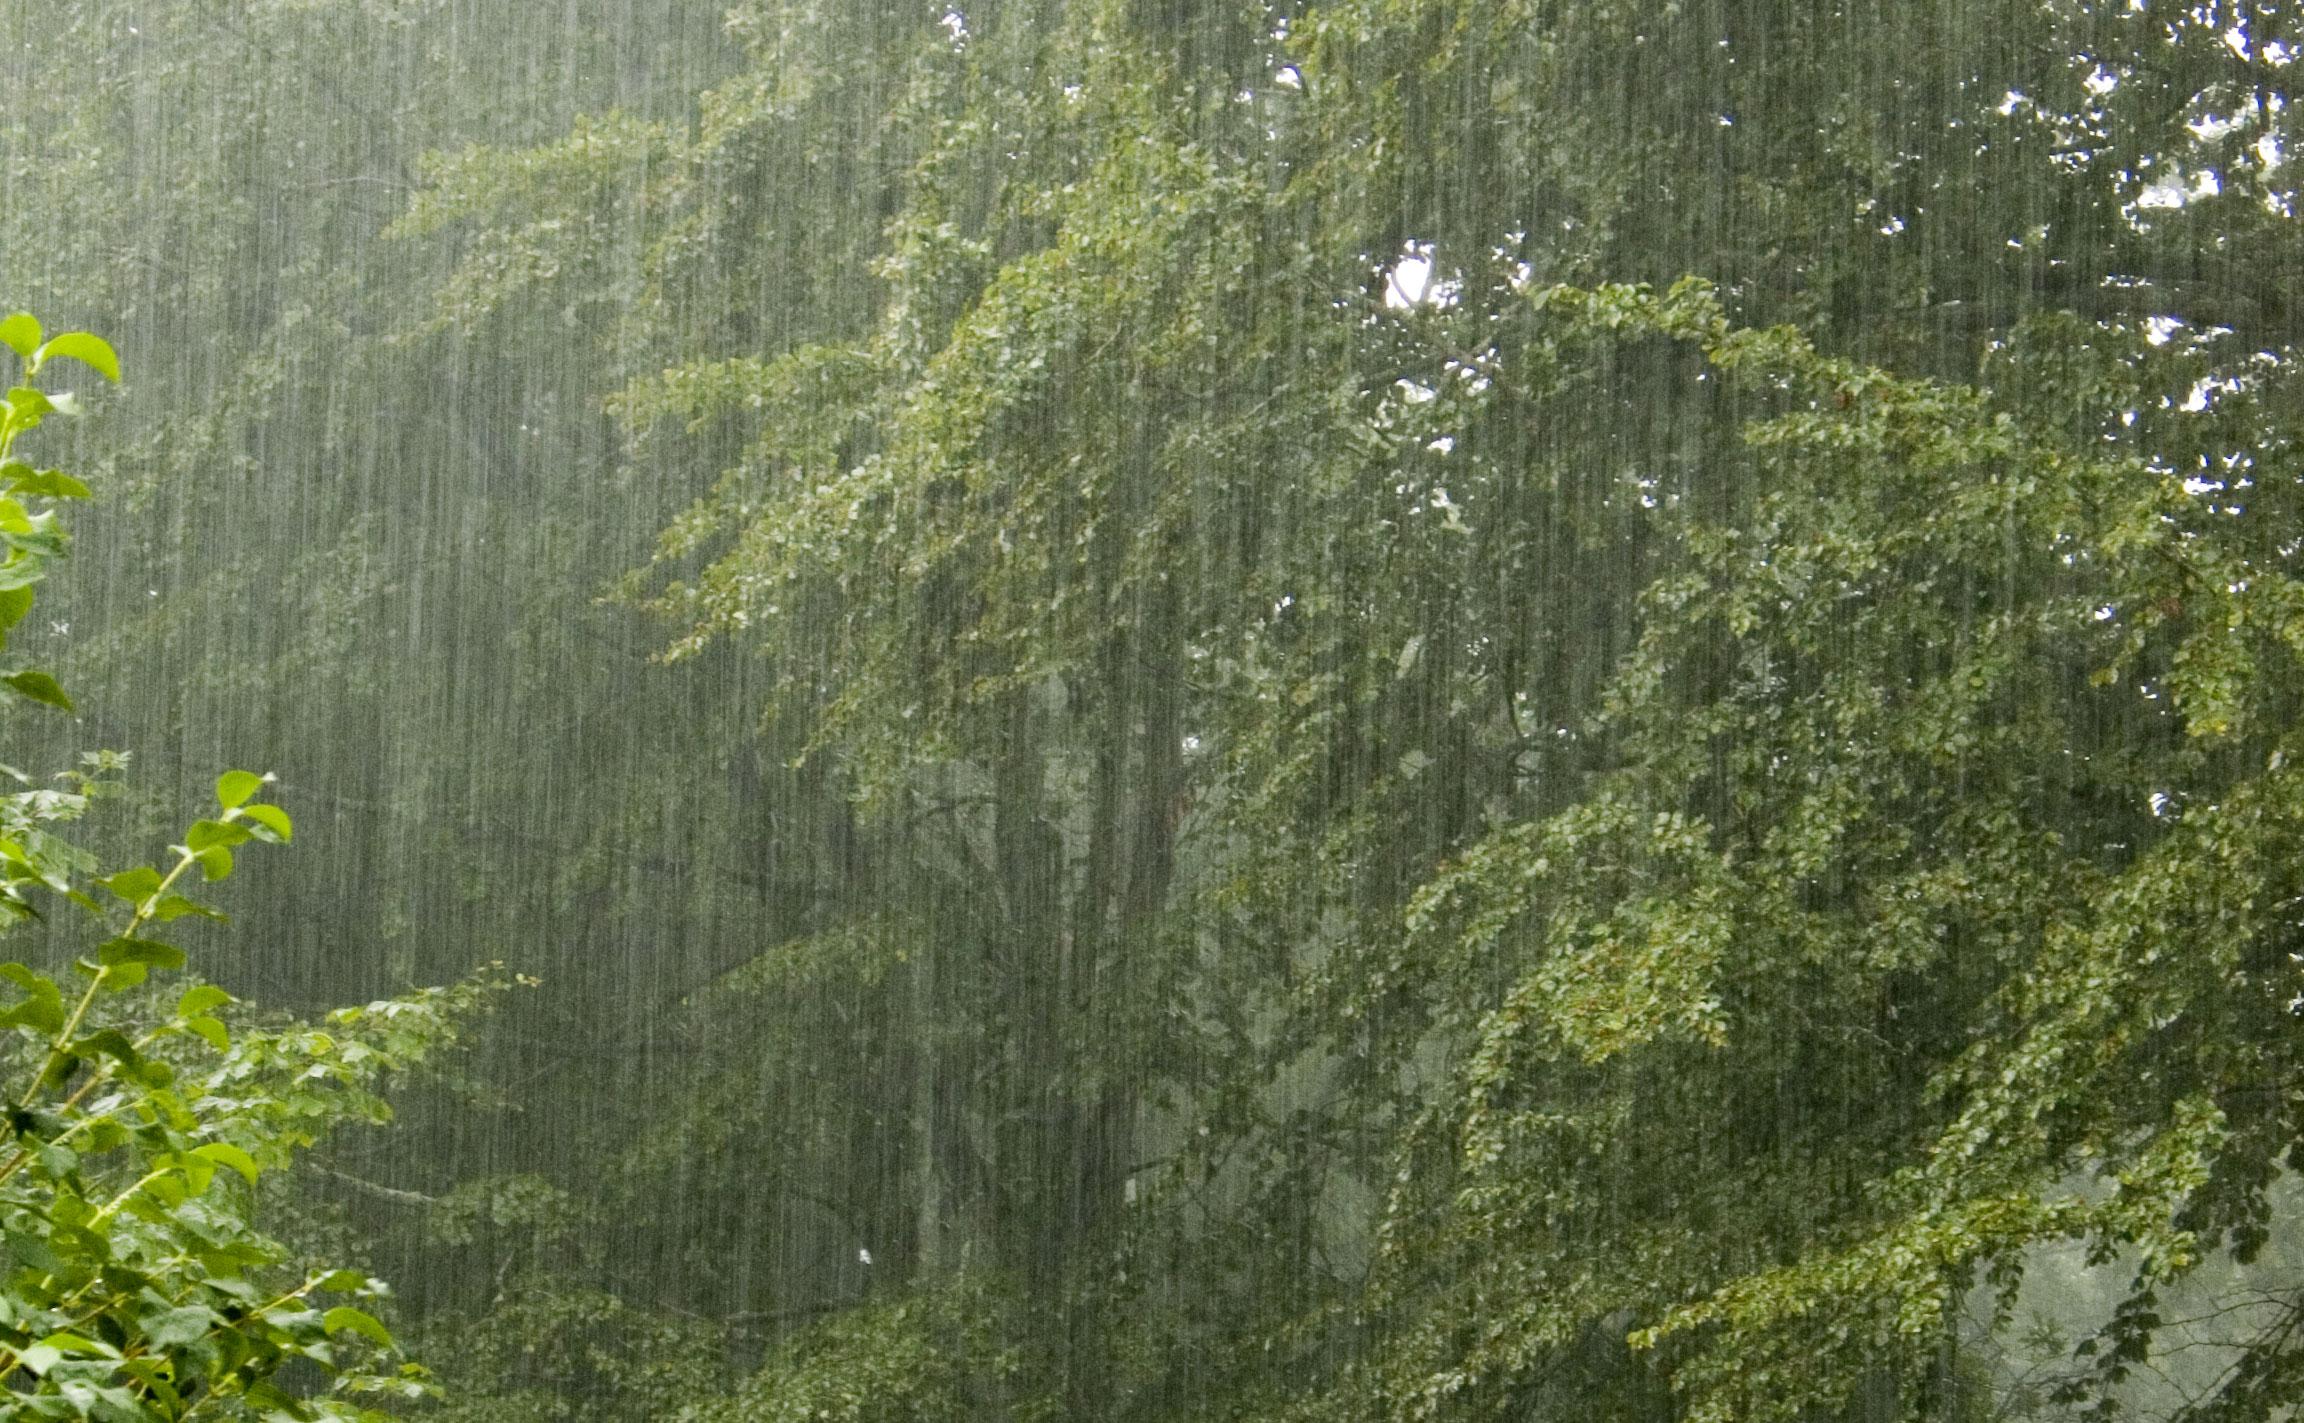 http://babajidesalu.files.wordpress.com/2009/07/rain24-hours.jpg